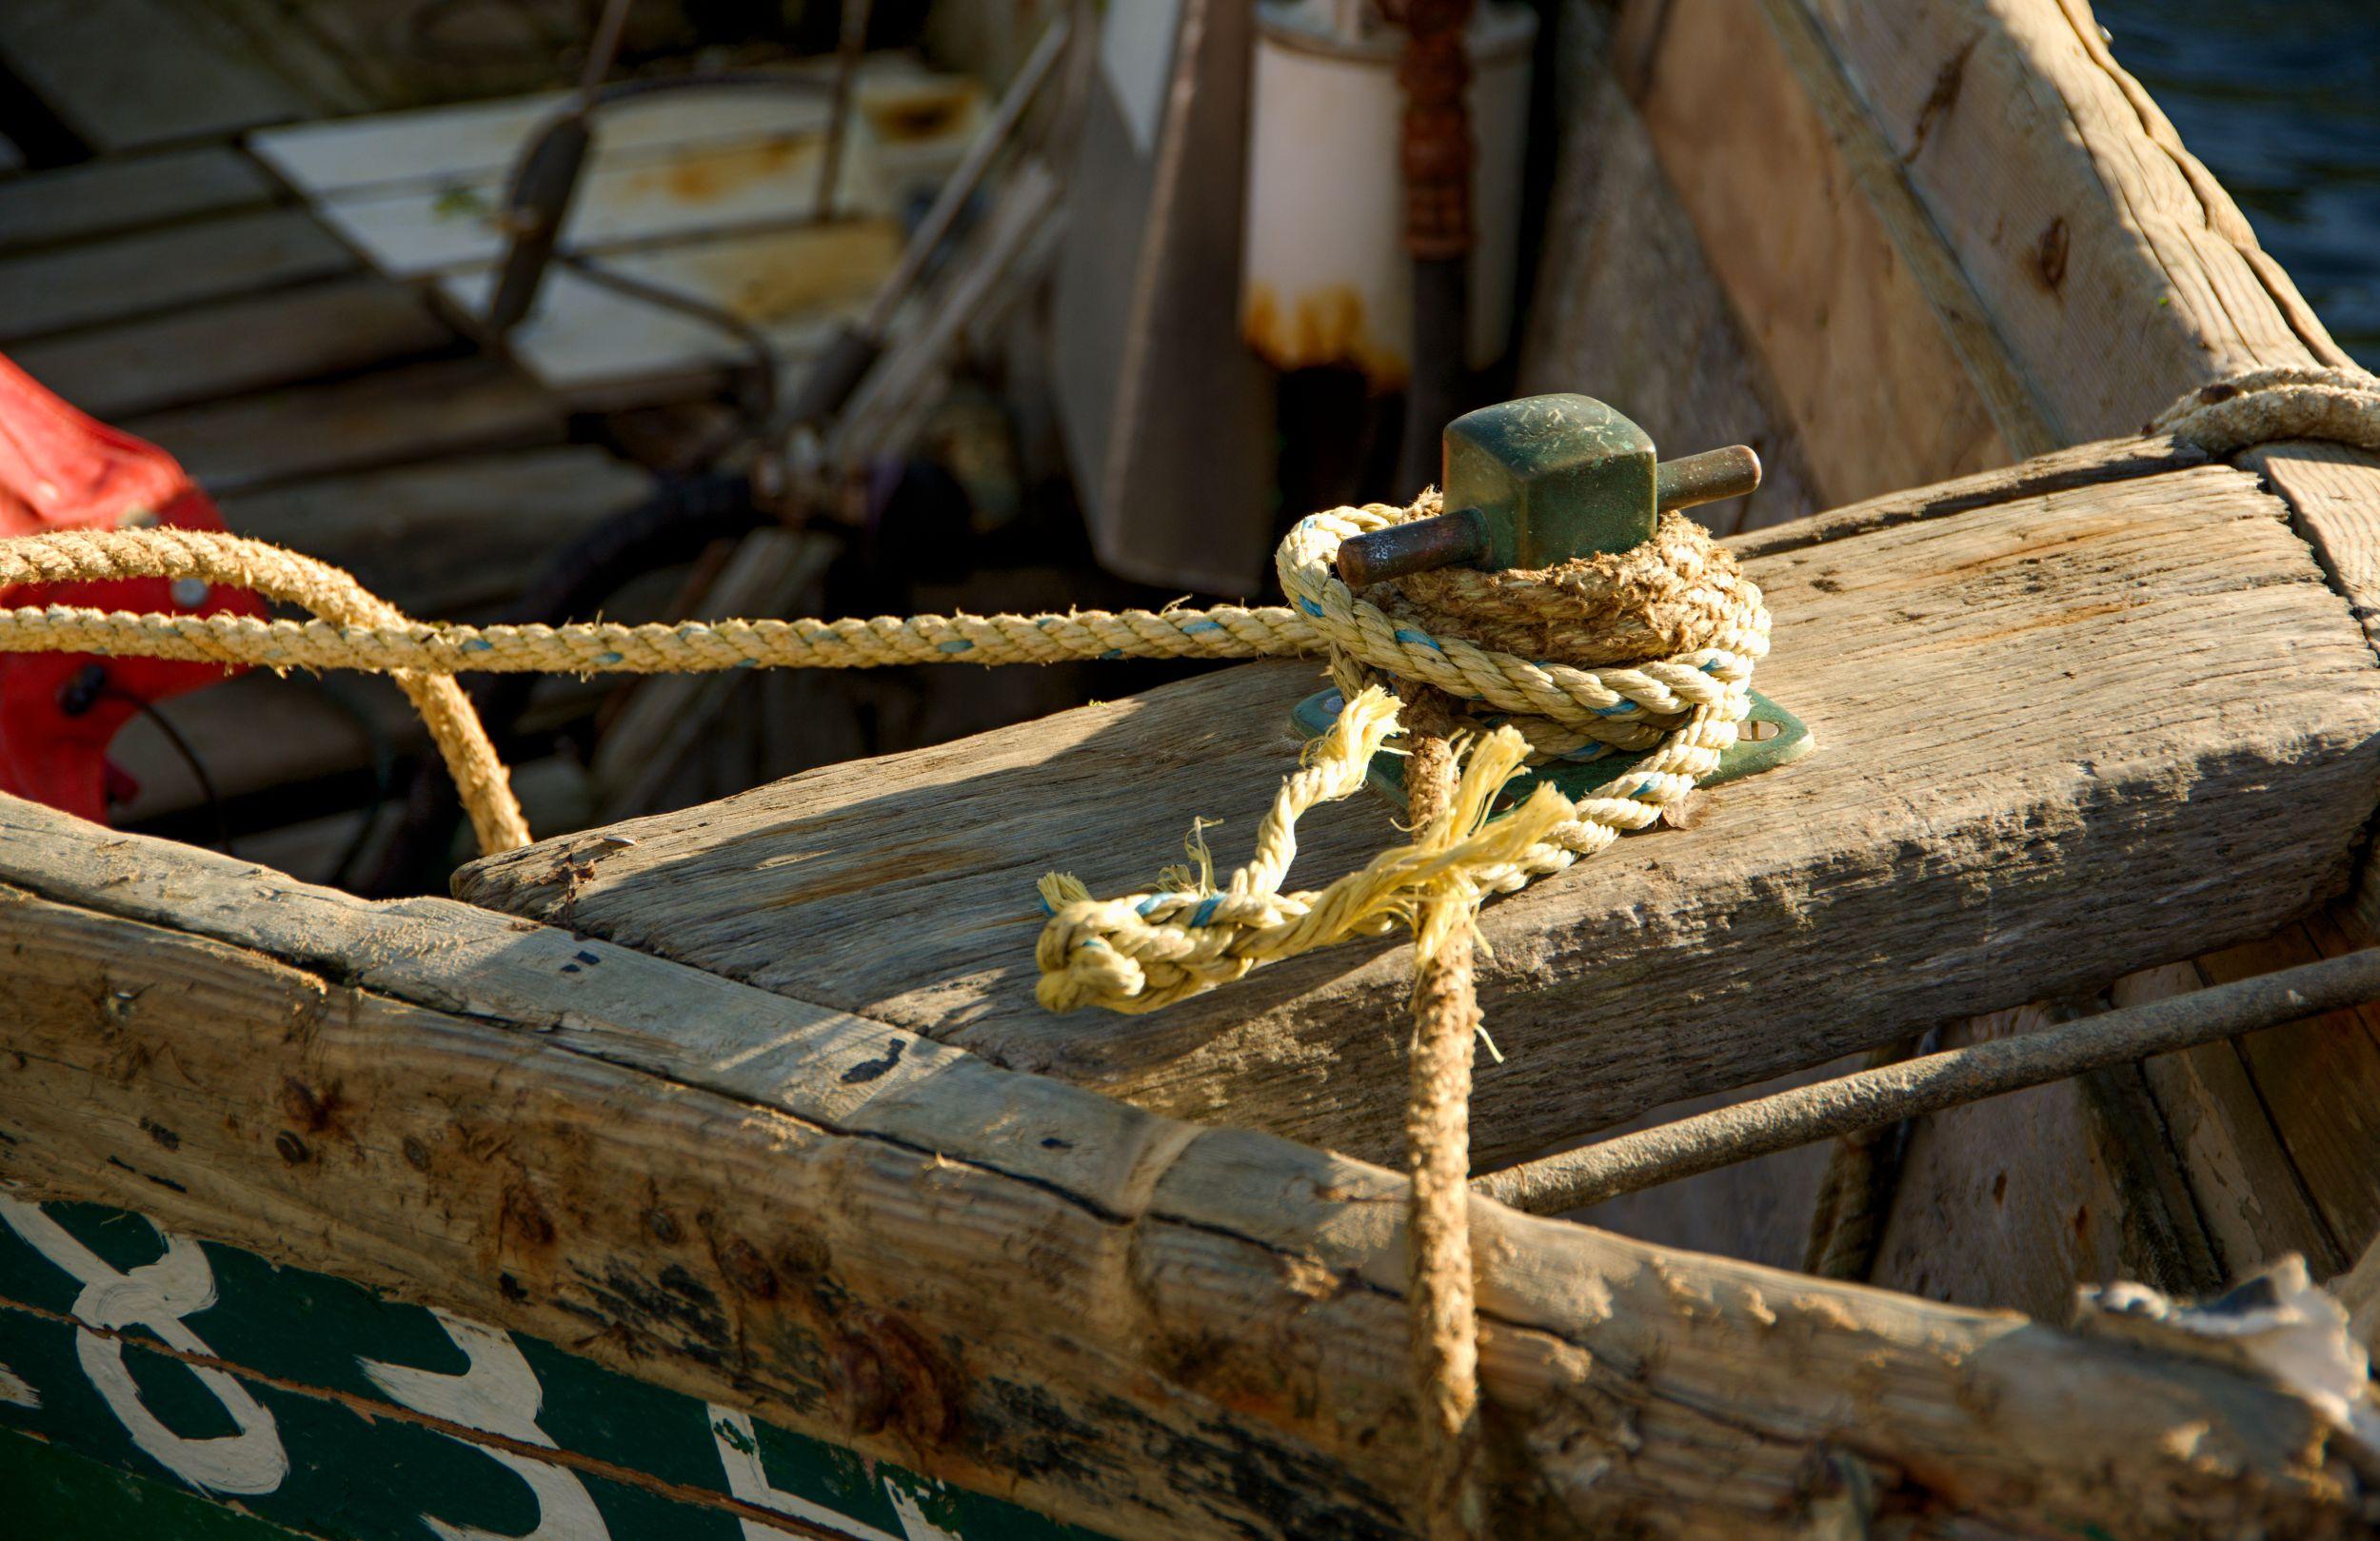 Boat_Anchor_Cleat_Wood_Marthas_Vineyard.jpg